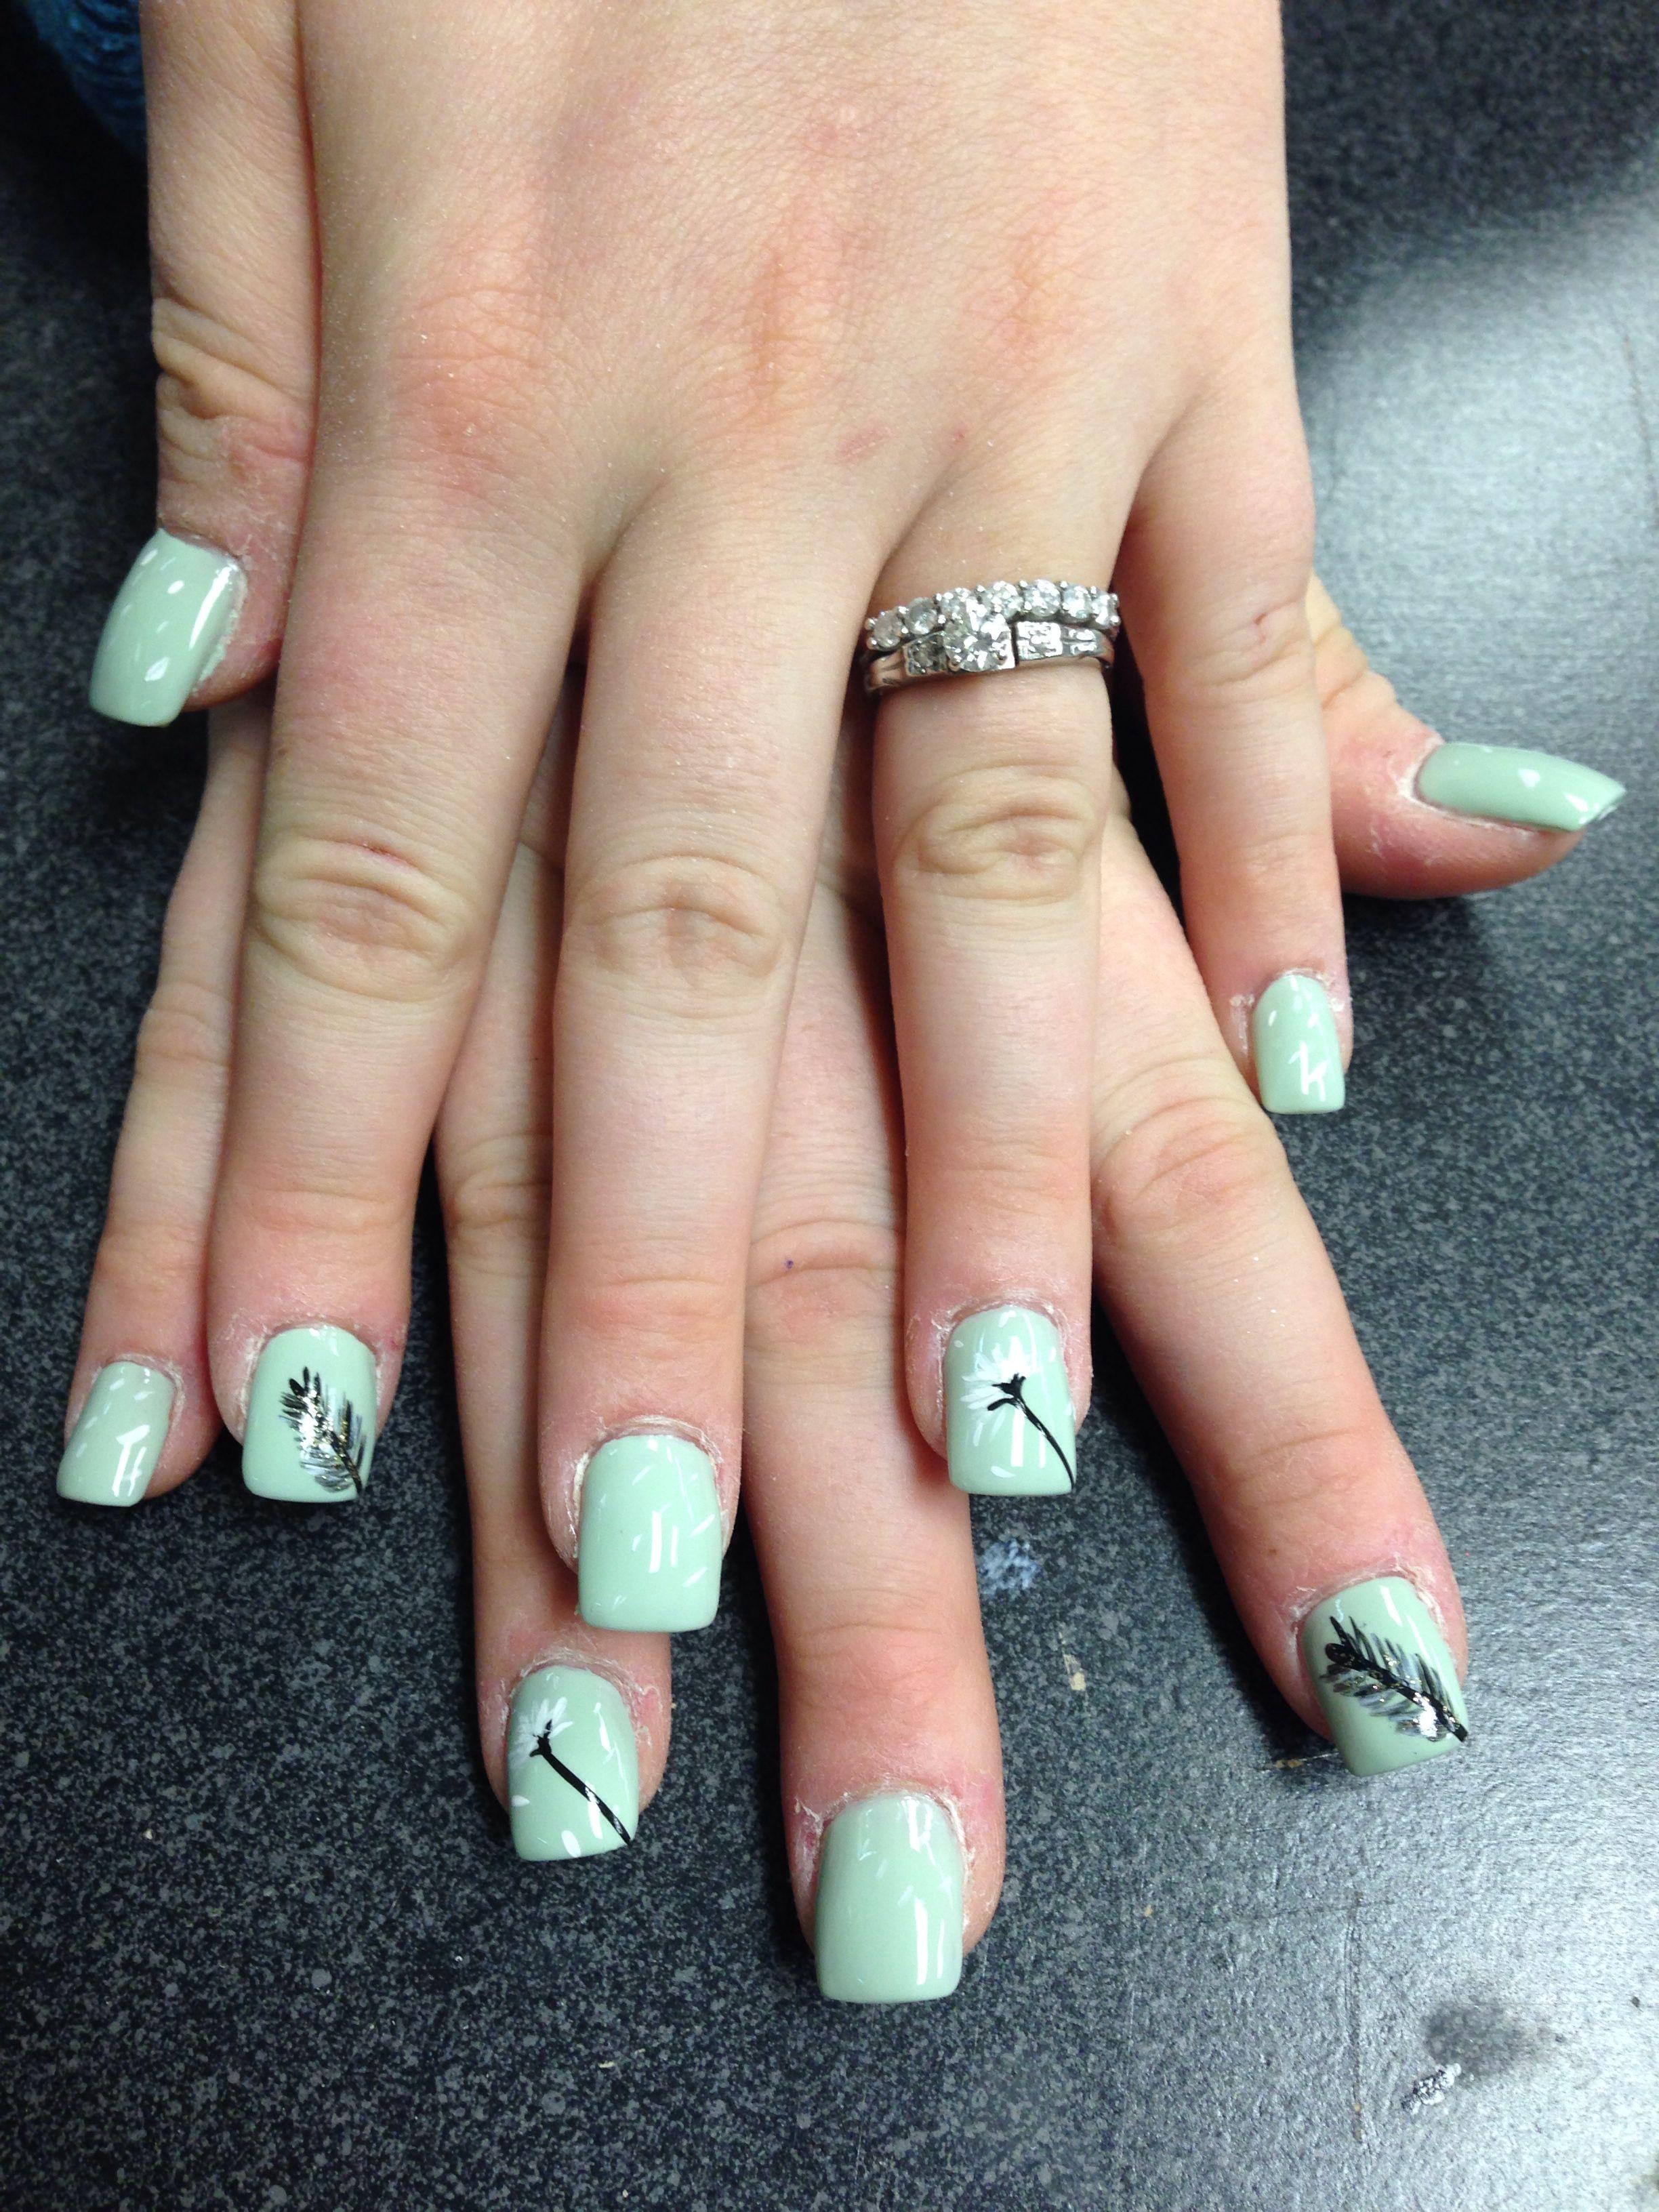 Minty Dandelion Design | Nail Designs | Pinterest | Nails, Design ...